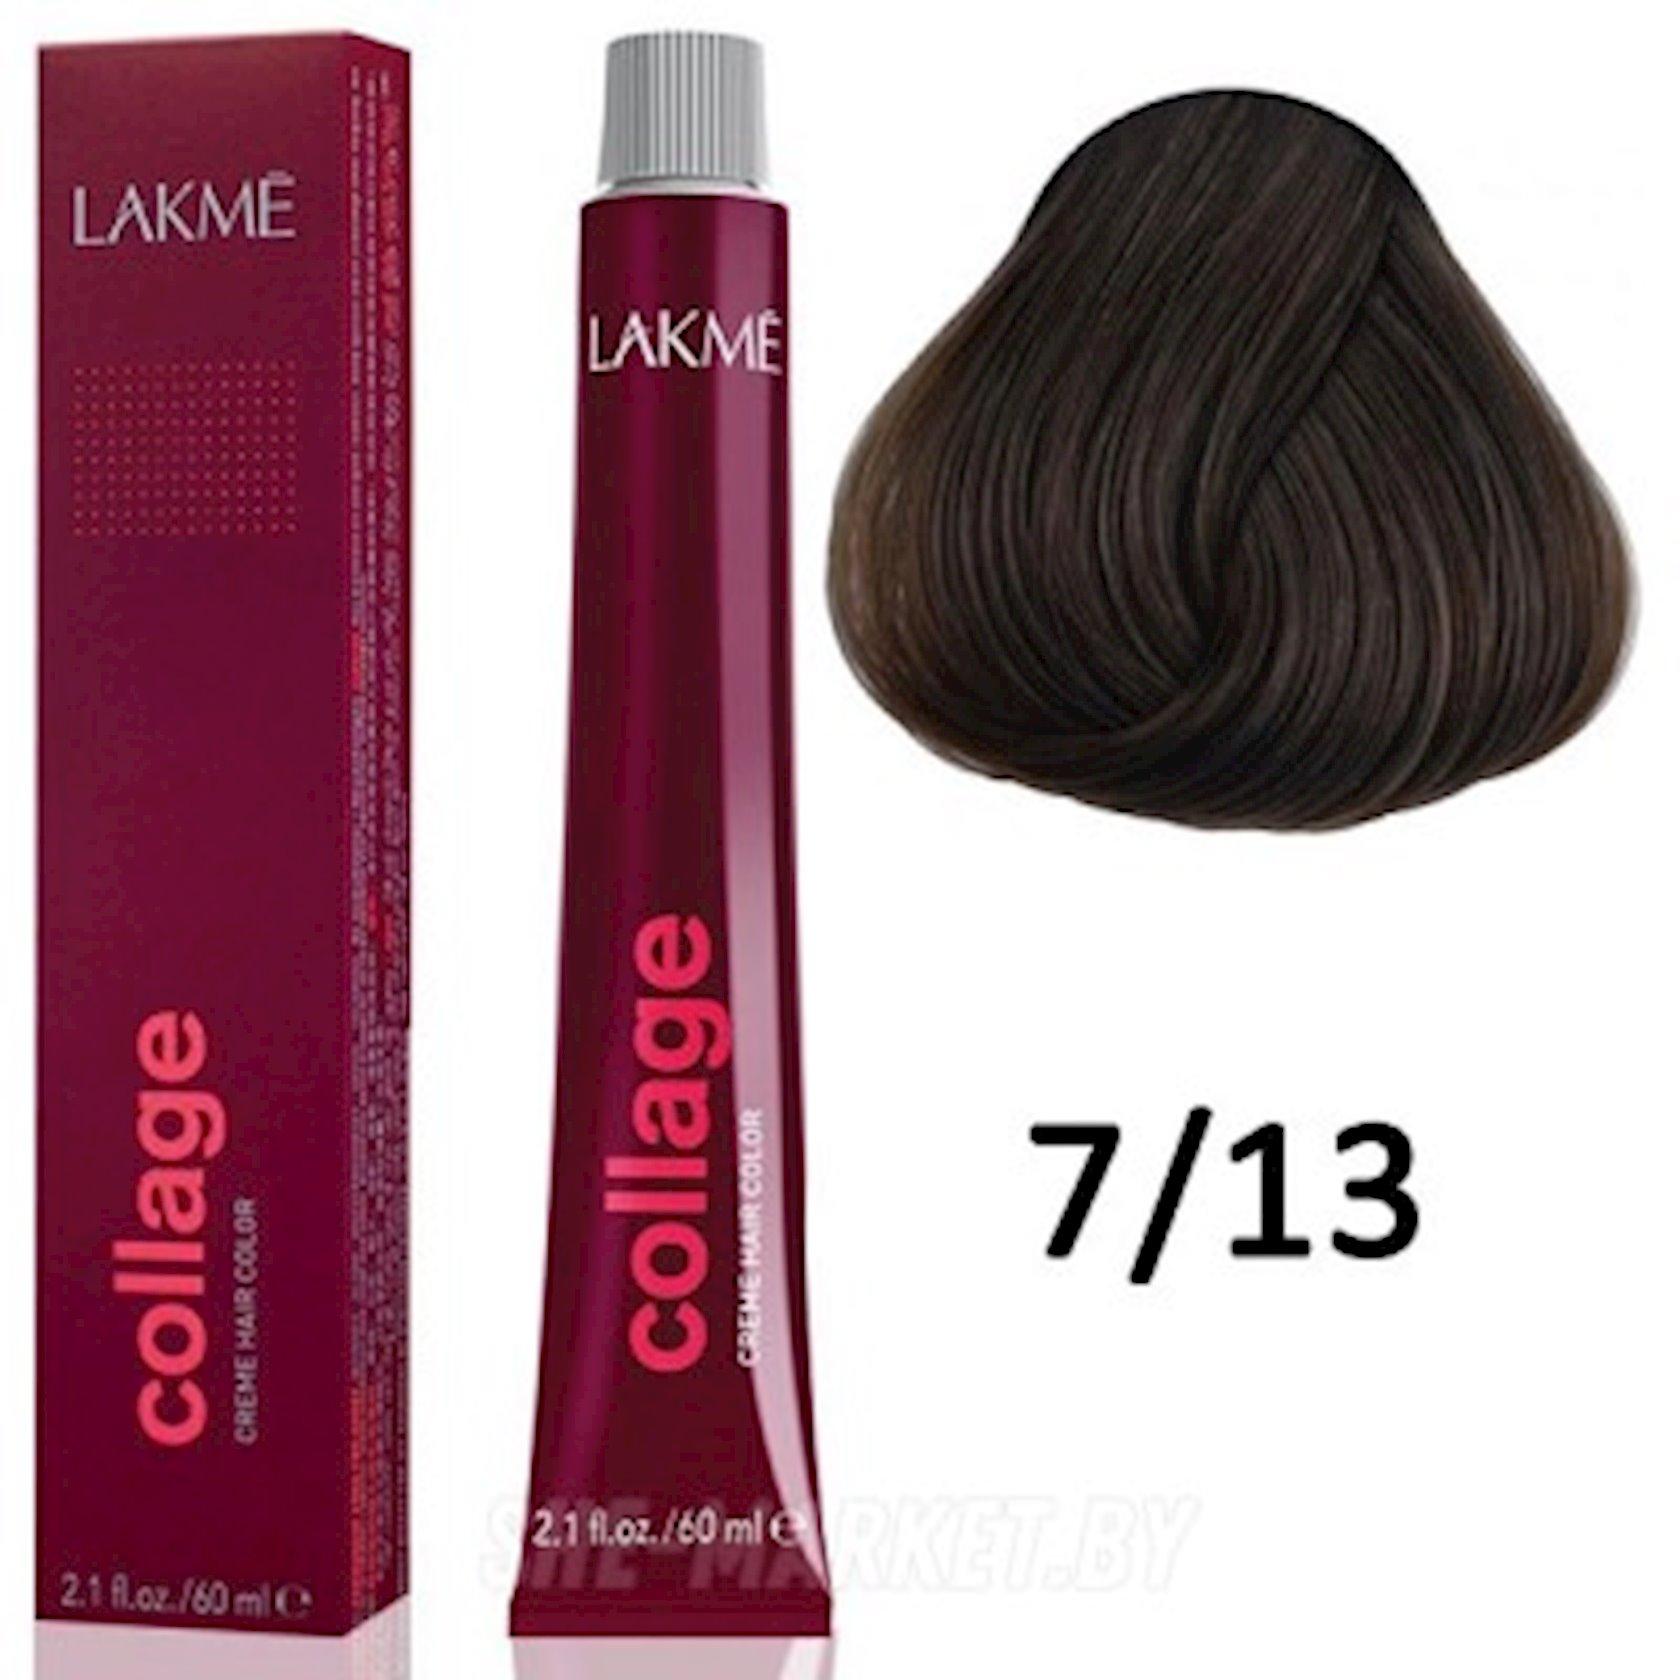 Saç üçün qalıcı krem-boya Lakme Collage 7/13 Orta blond bej